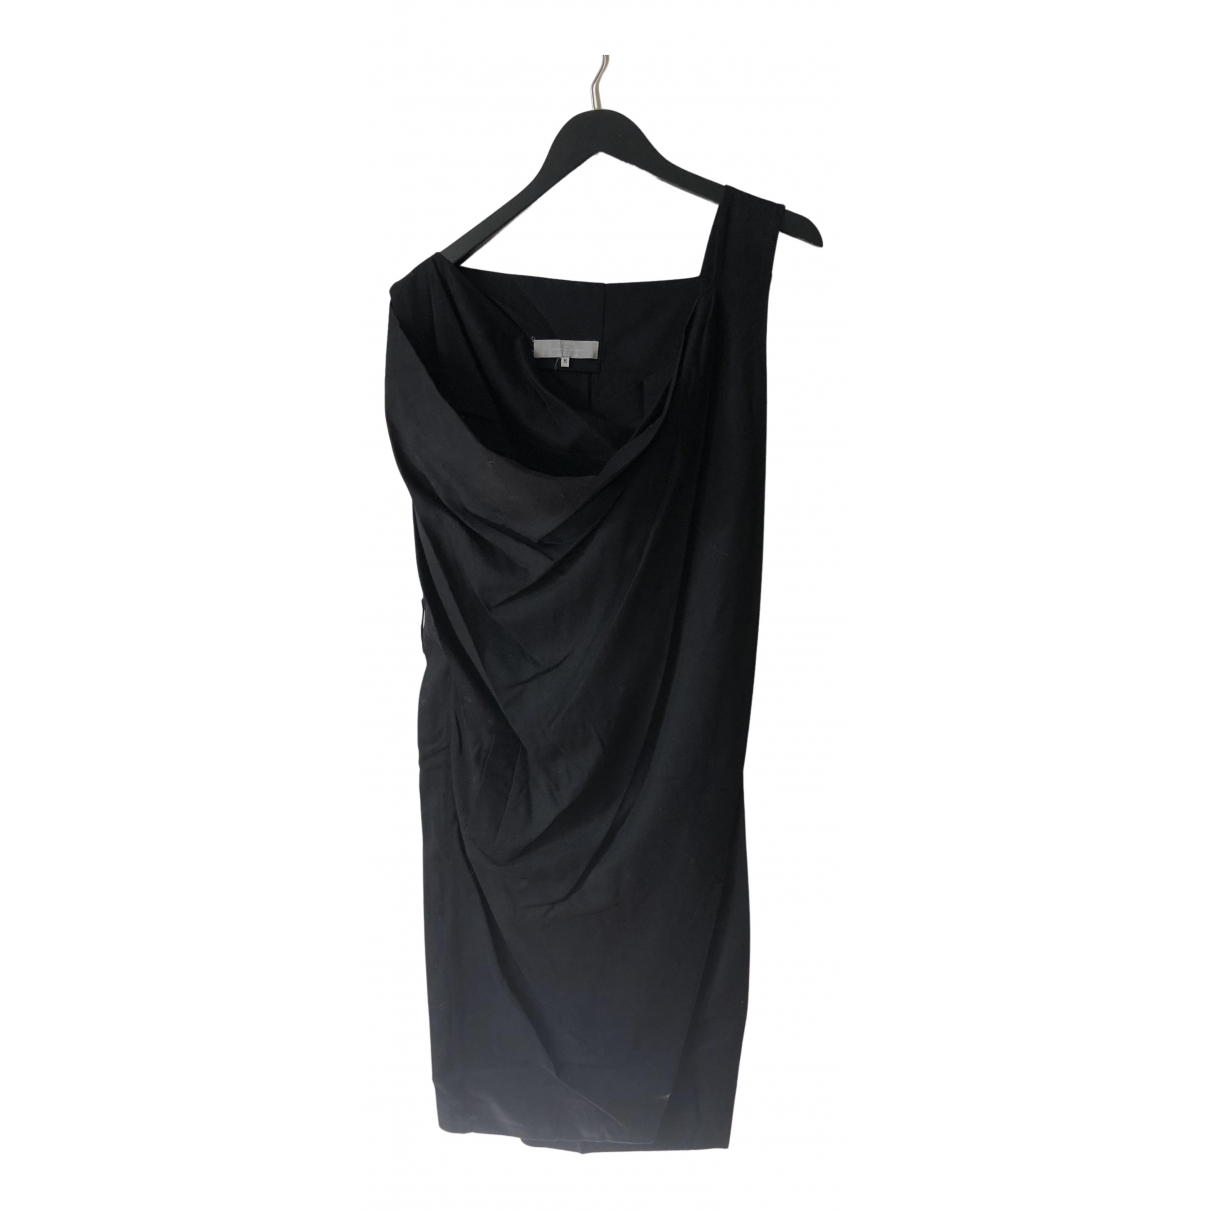 Preen By Thornton Bregazzi N Black Cotton dress for Women M International